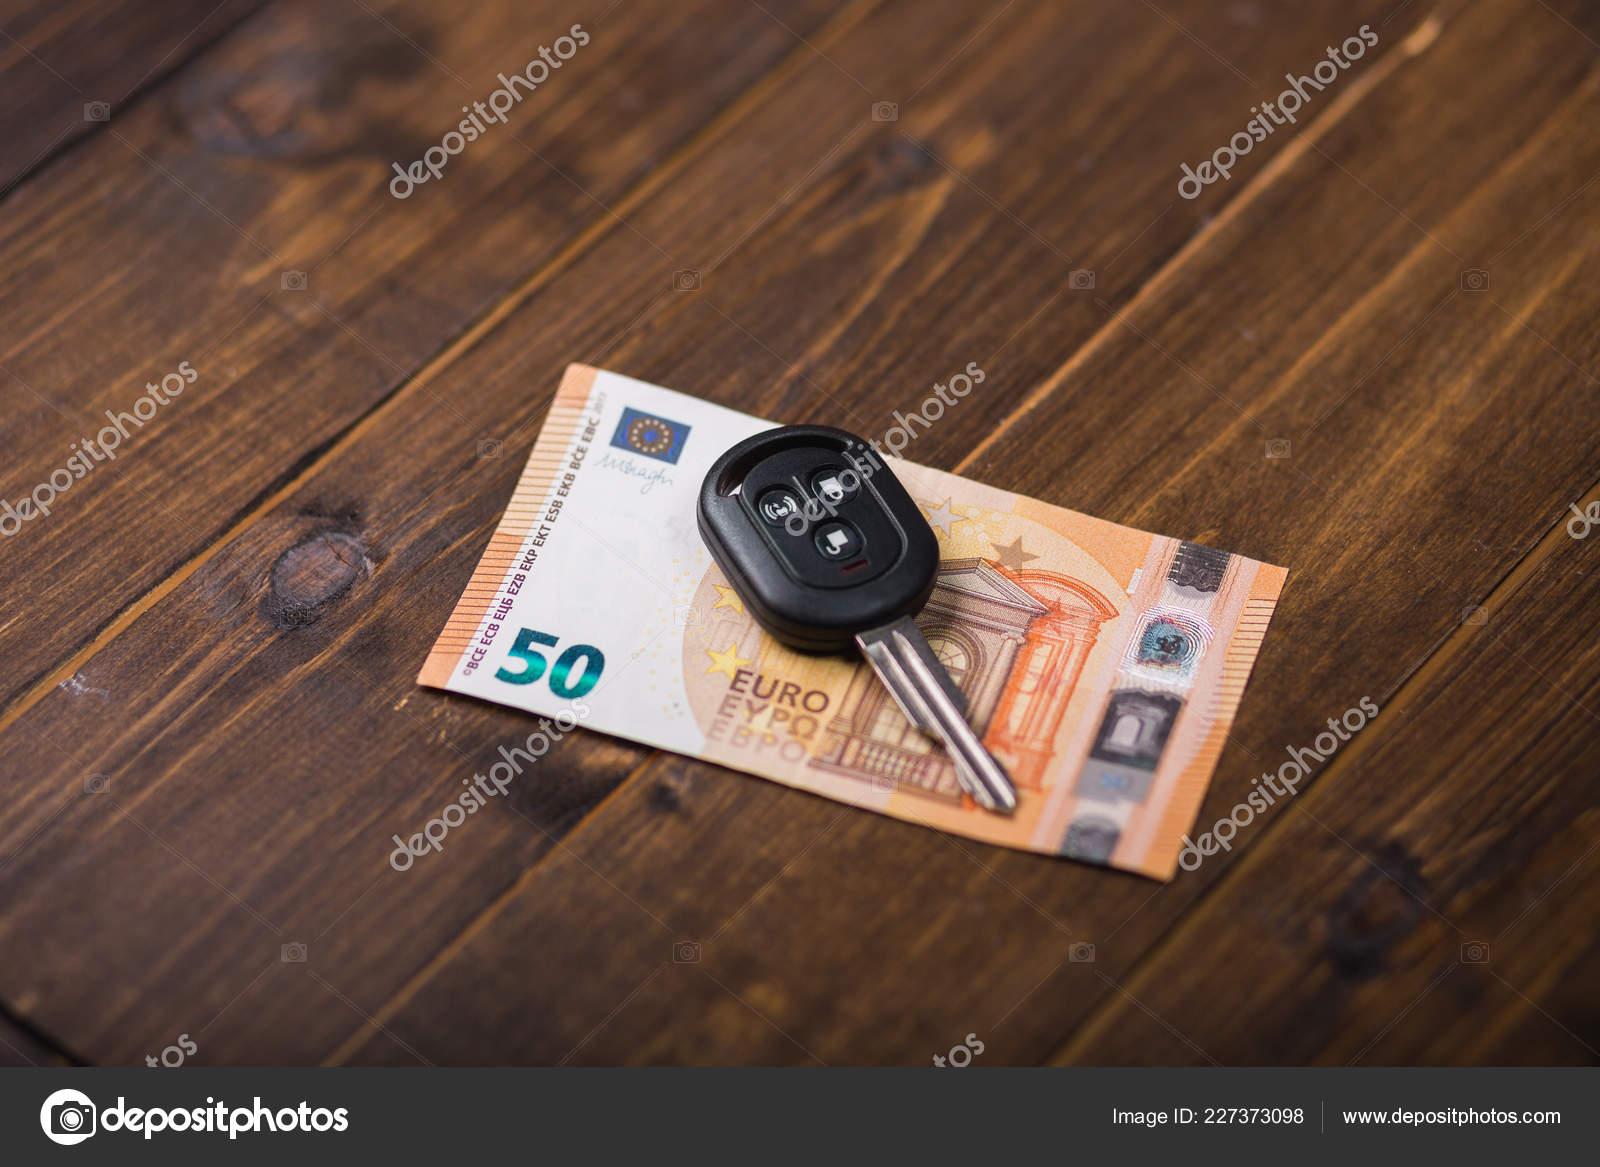 Fifty Euros Banknote And Car Keys Stock Photo C Shigapov 227373098